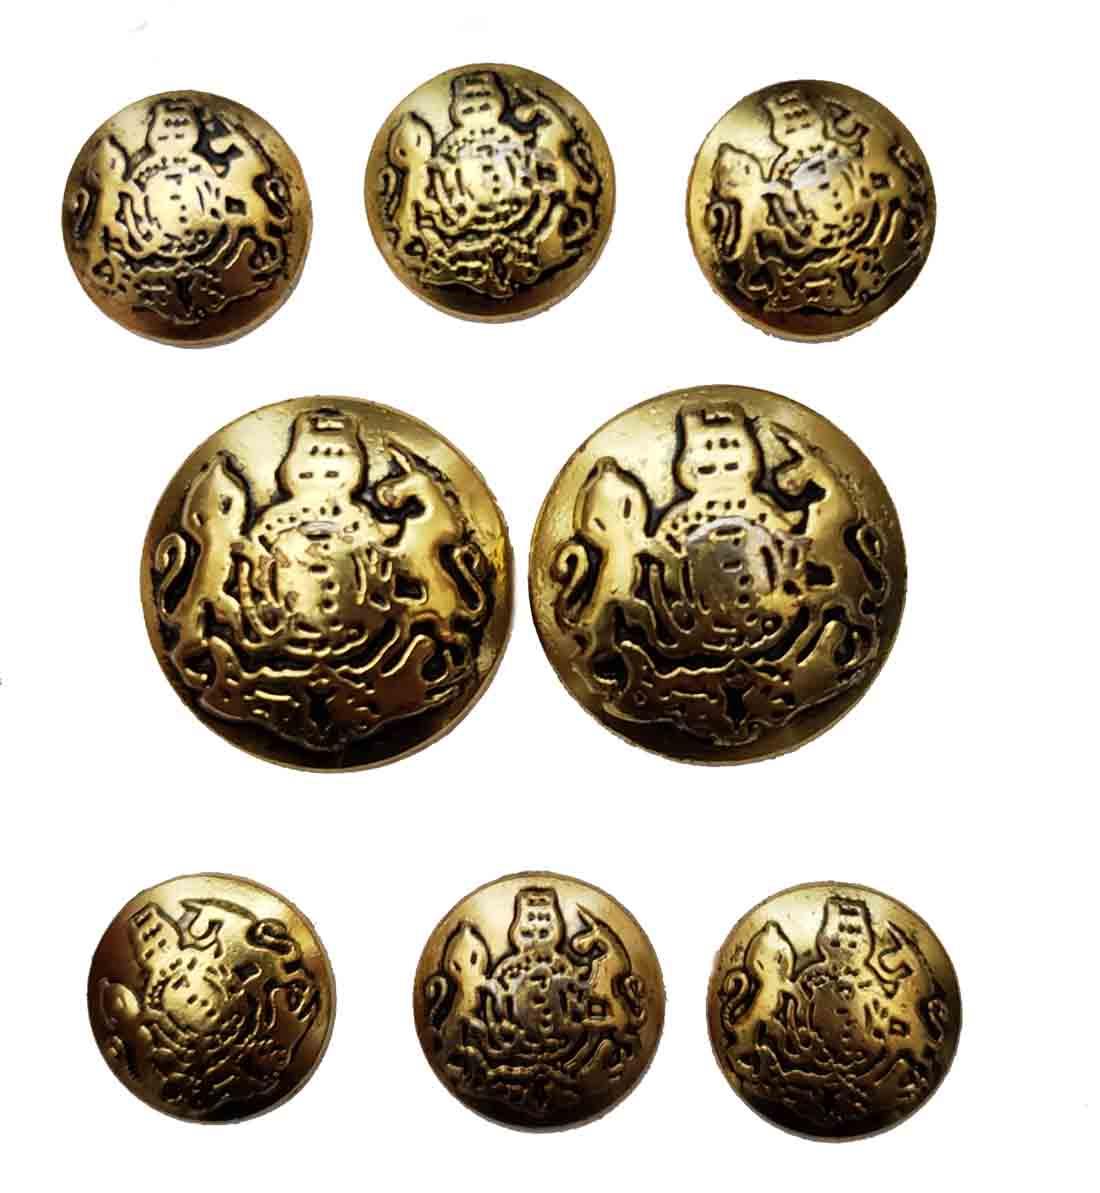 Vintage Jos A Bank Dome Blazer Buttons Set Gold Gray Brass Shank Lion Unicorn Men's